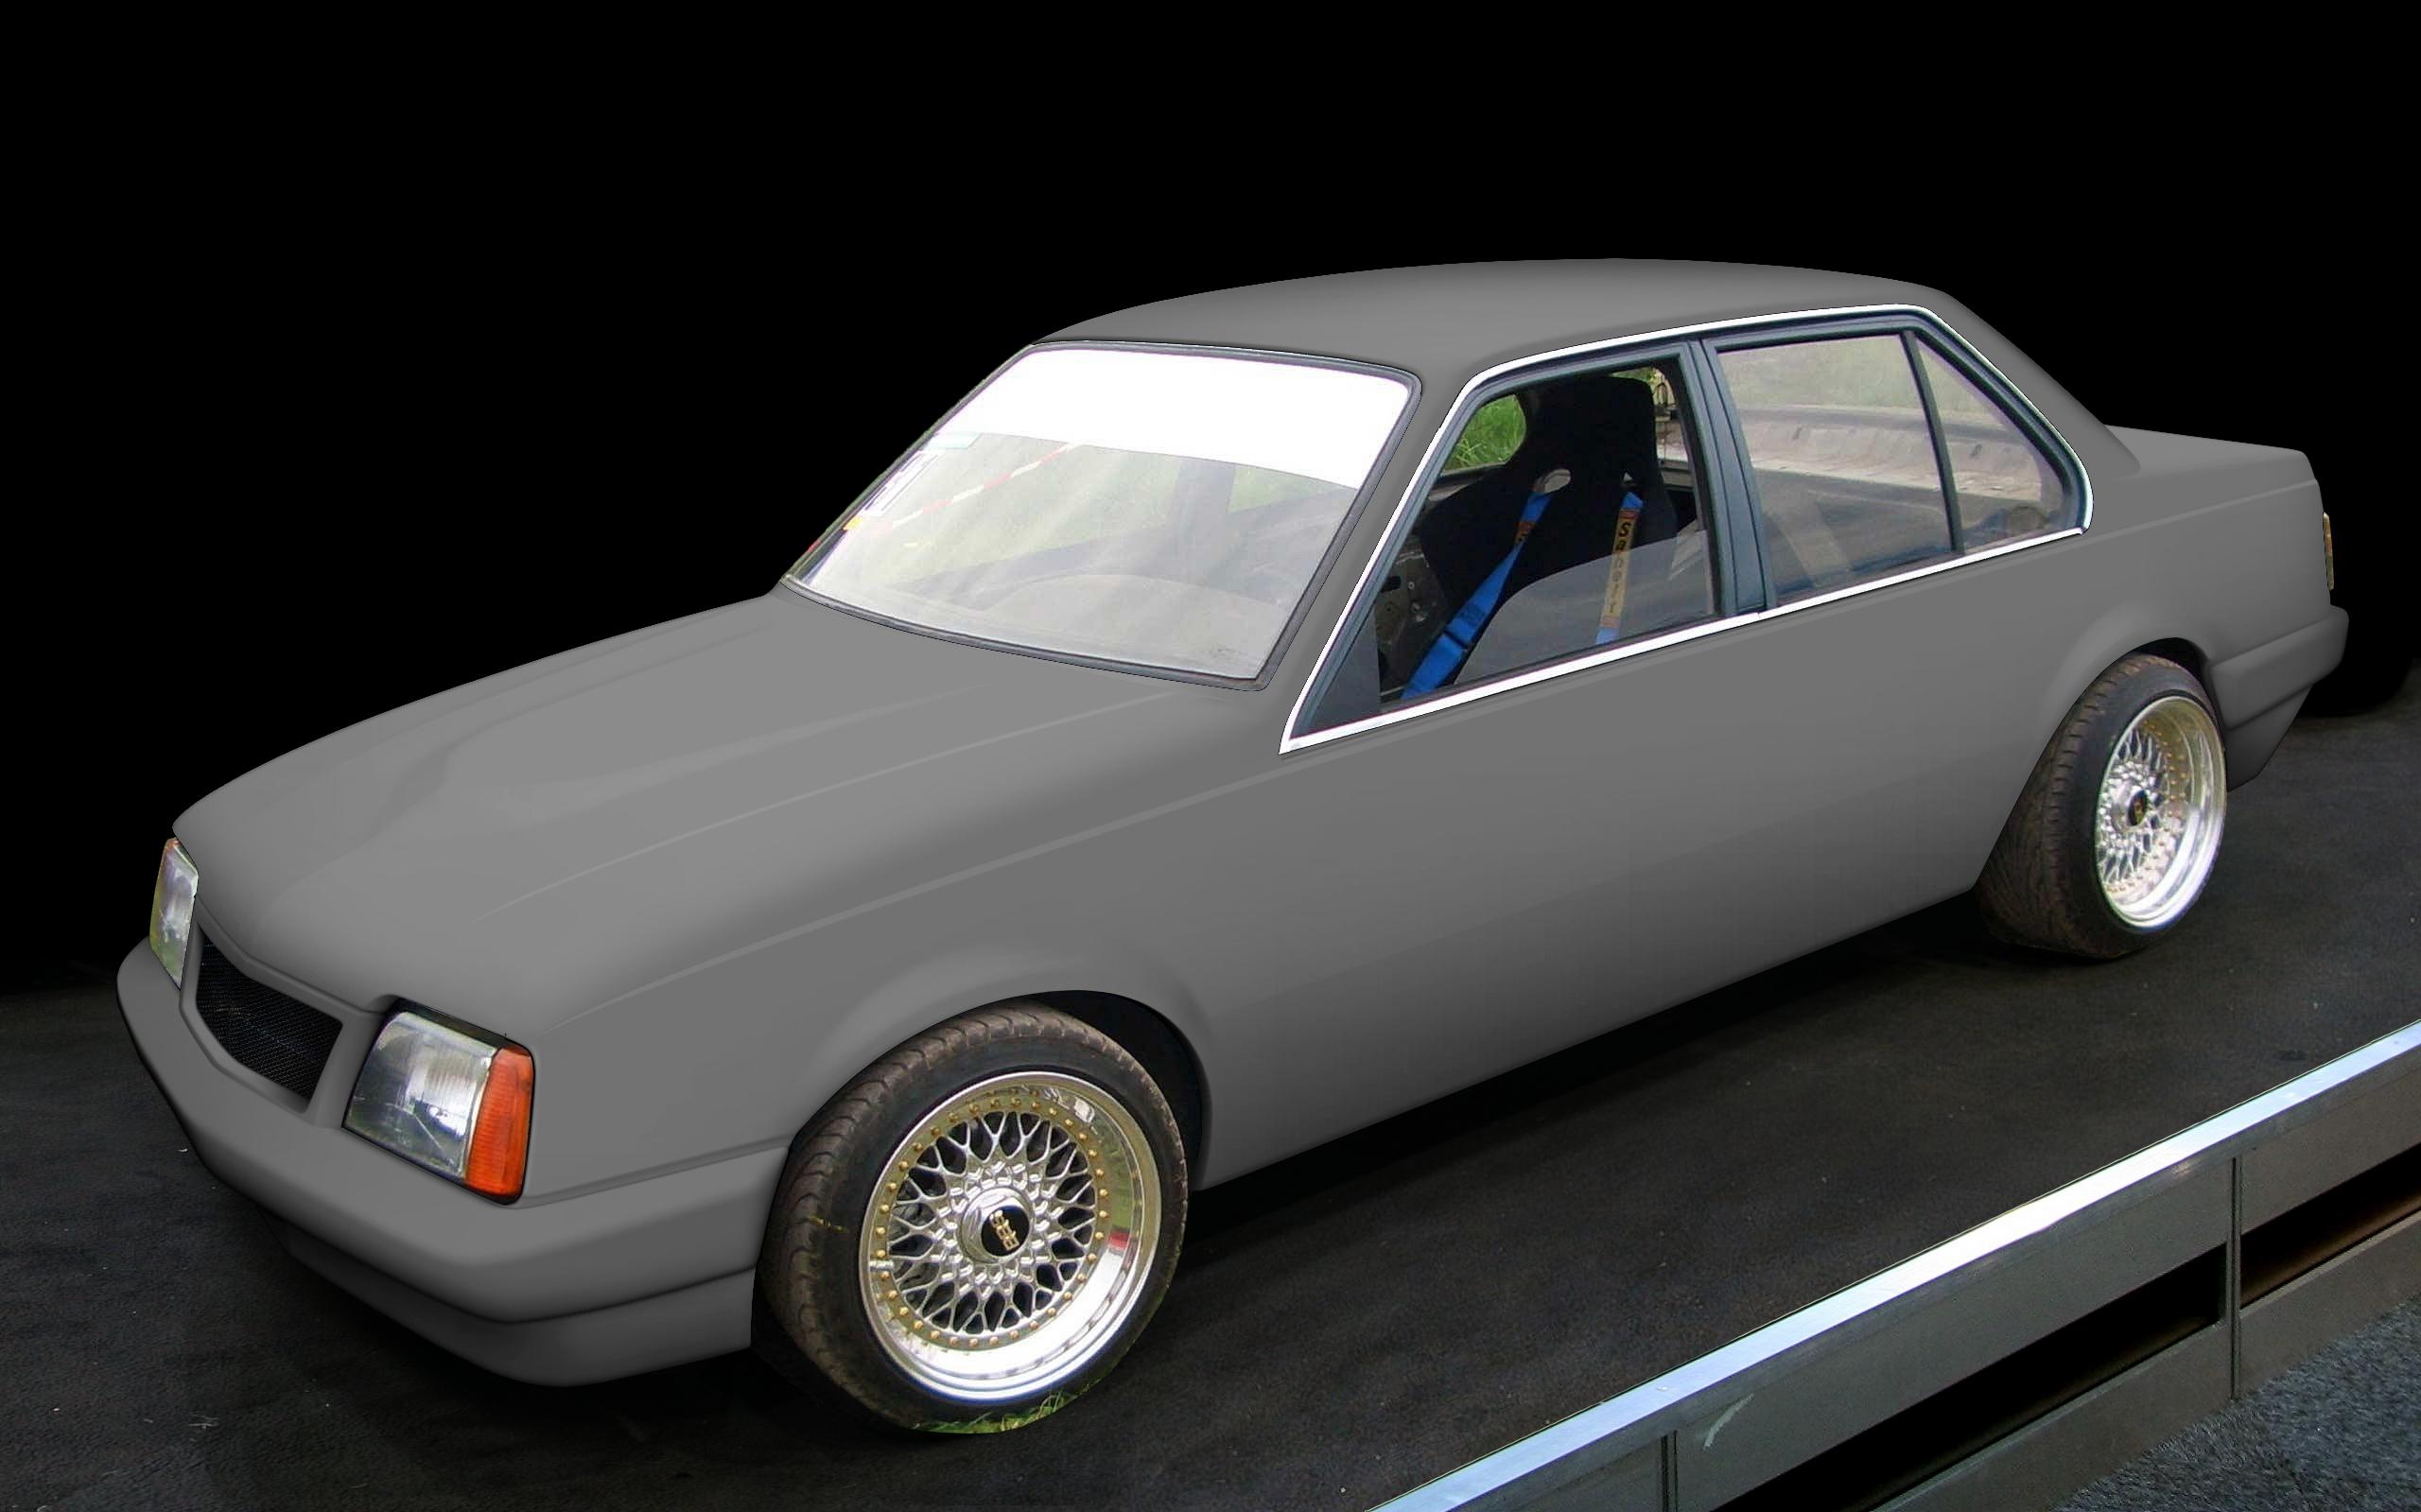 lamborghini murcielago lp670 4 car the cars. Black Bedroom Furniture Sets. Home Design Ideas